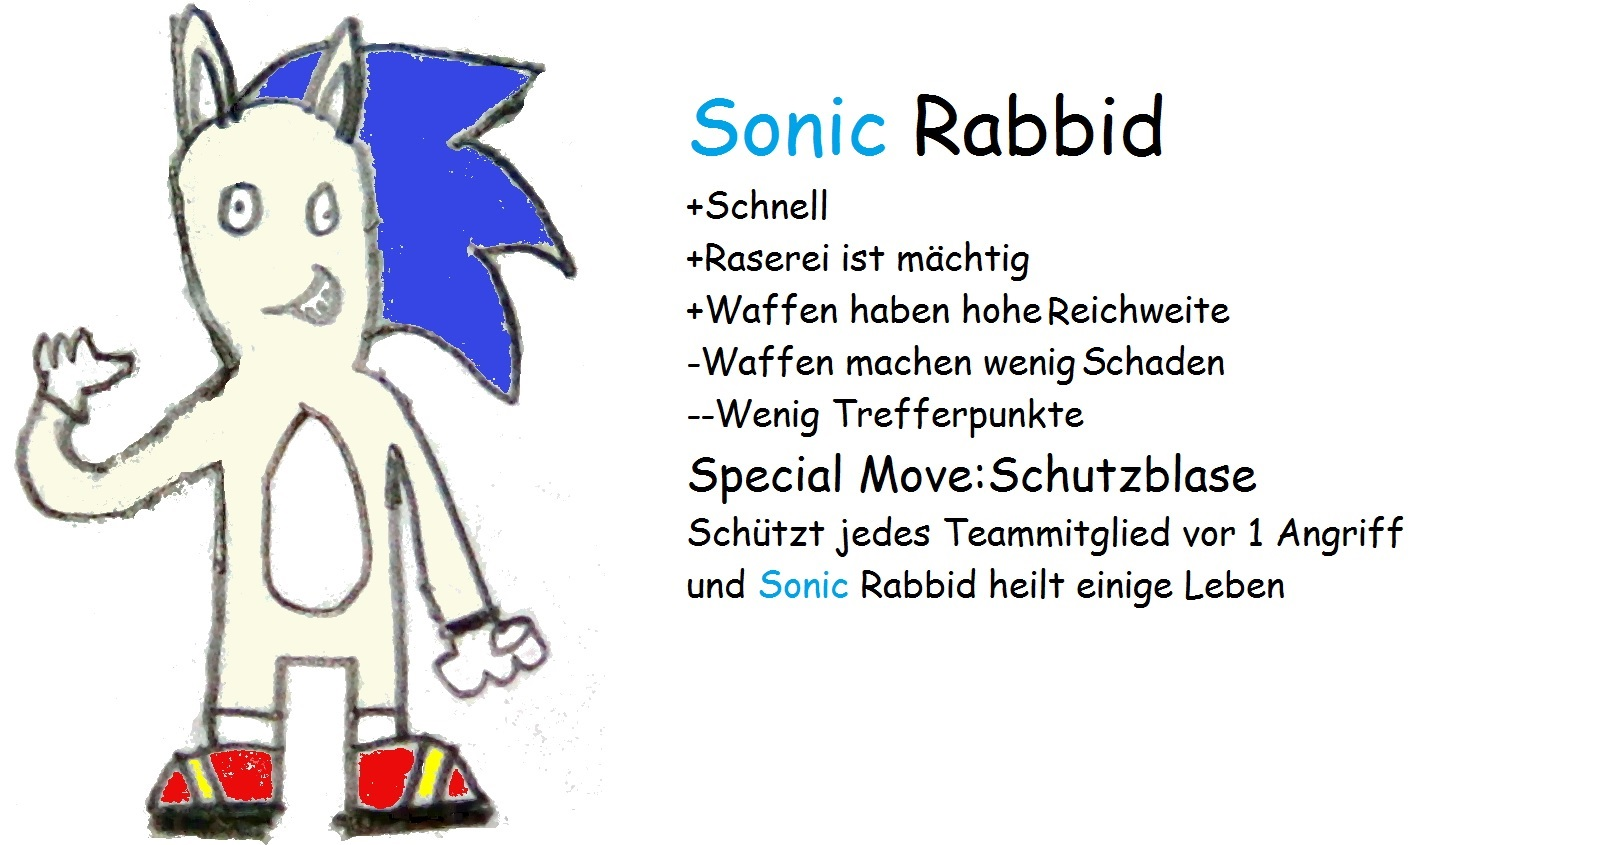 Tristans Sonic Rabbid